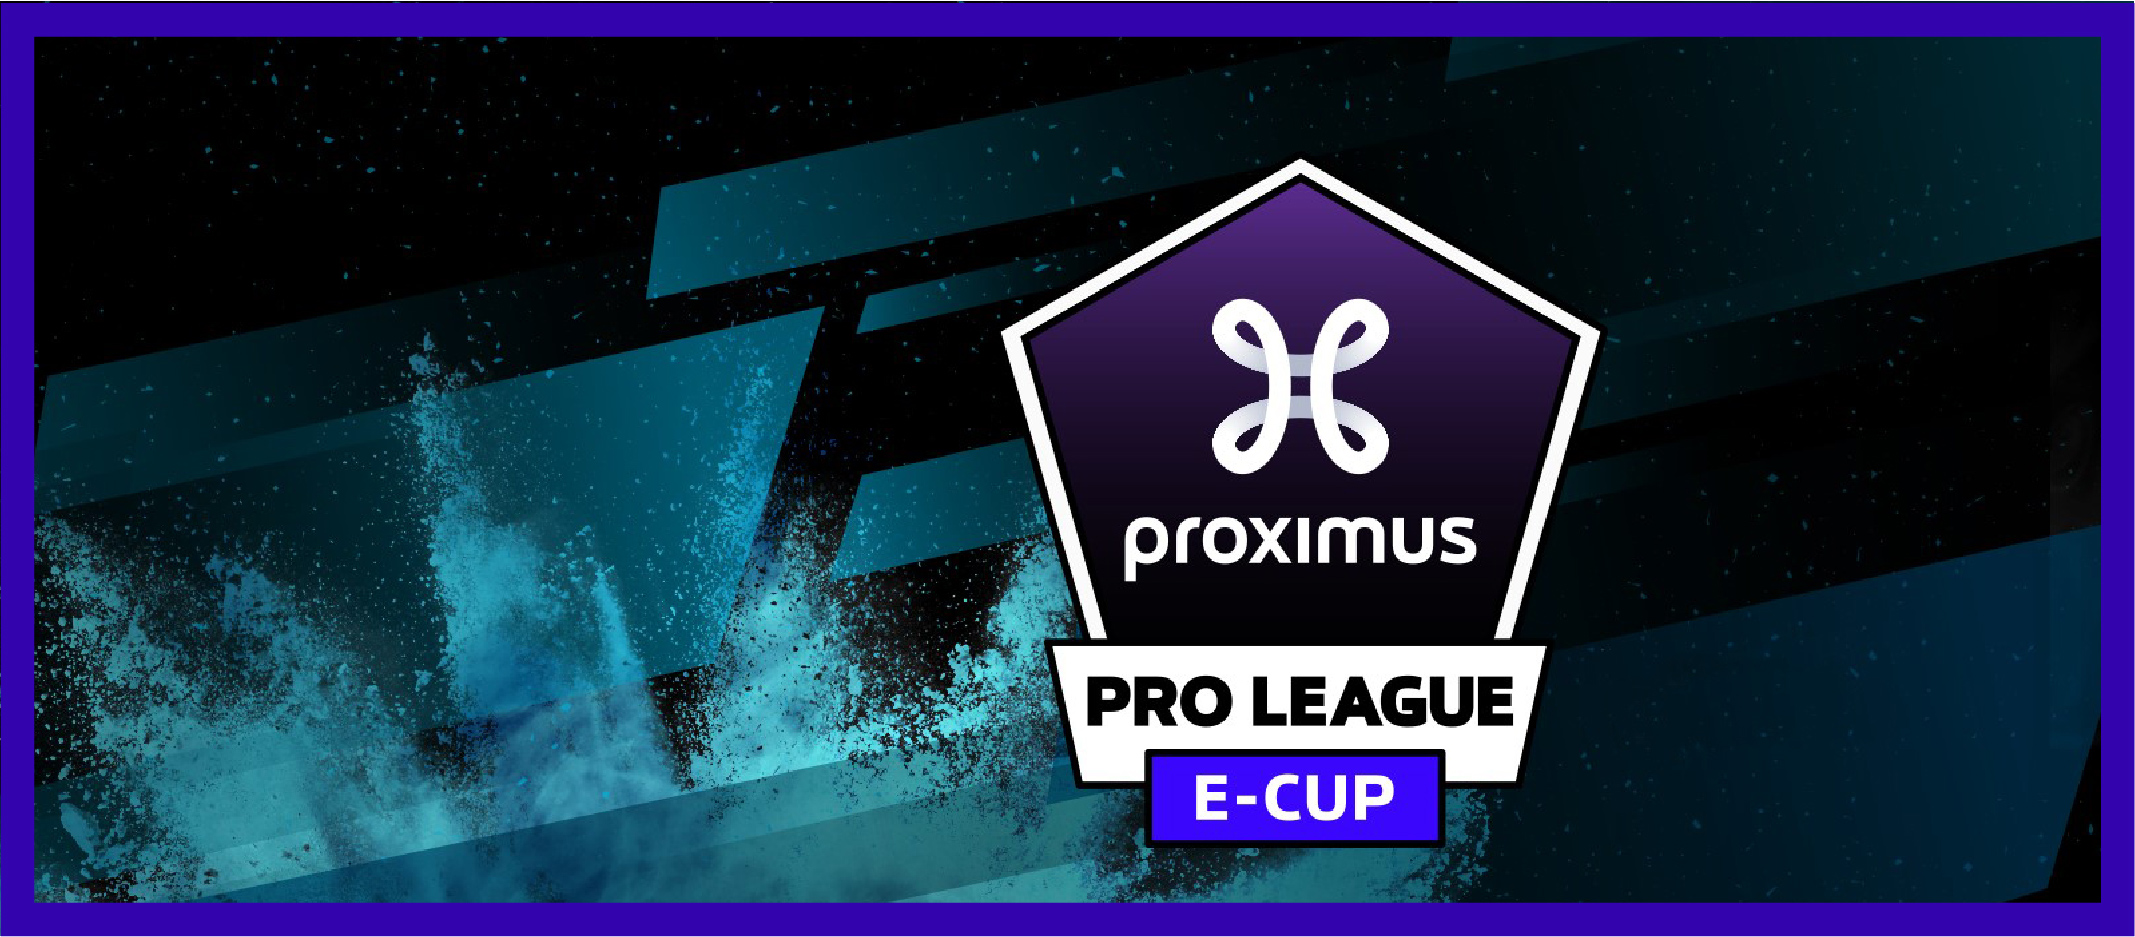 Proximus Pro league E-cup